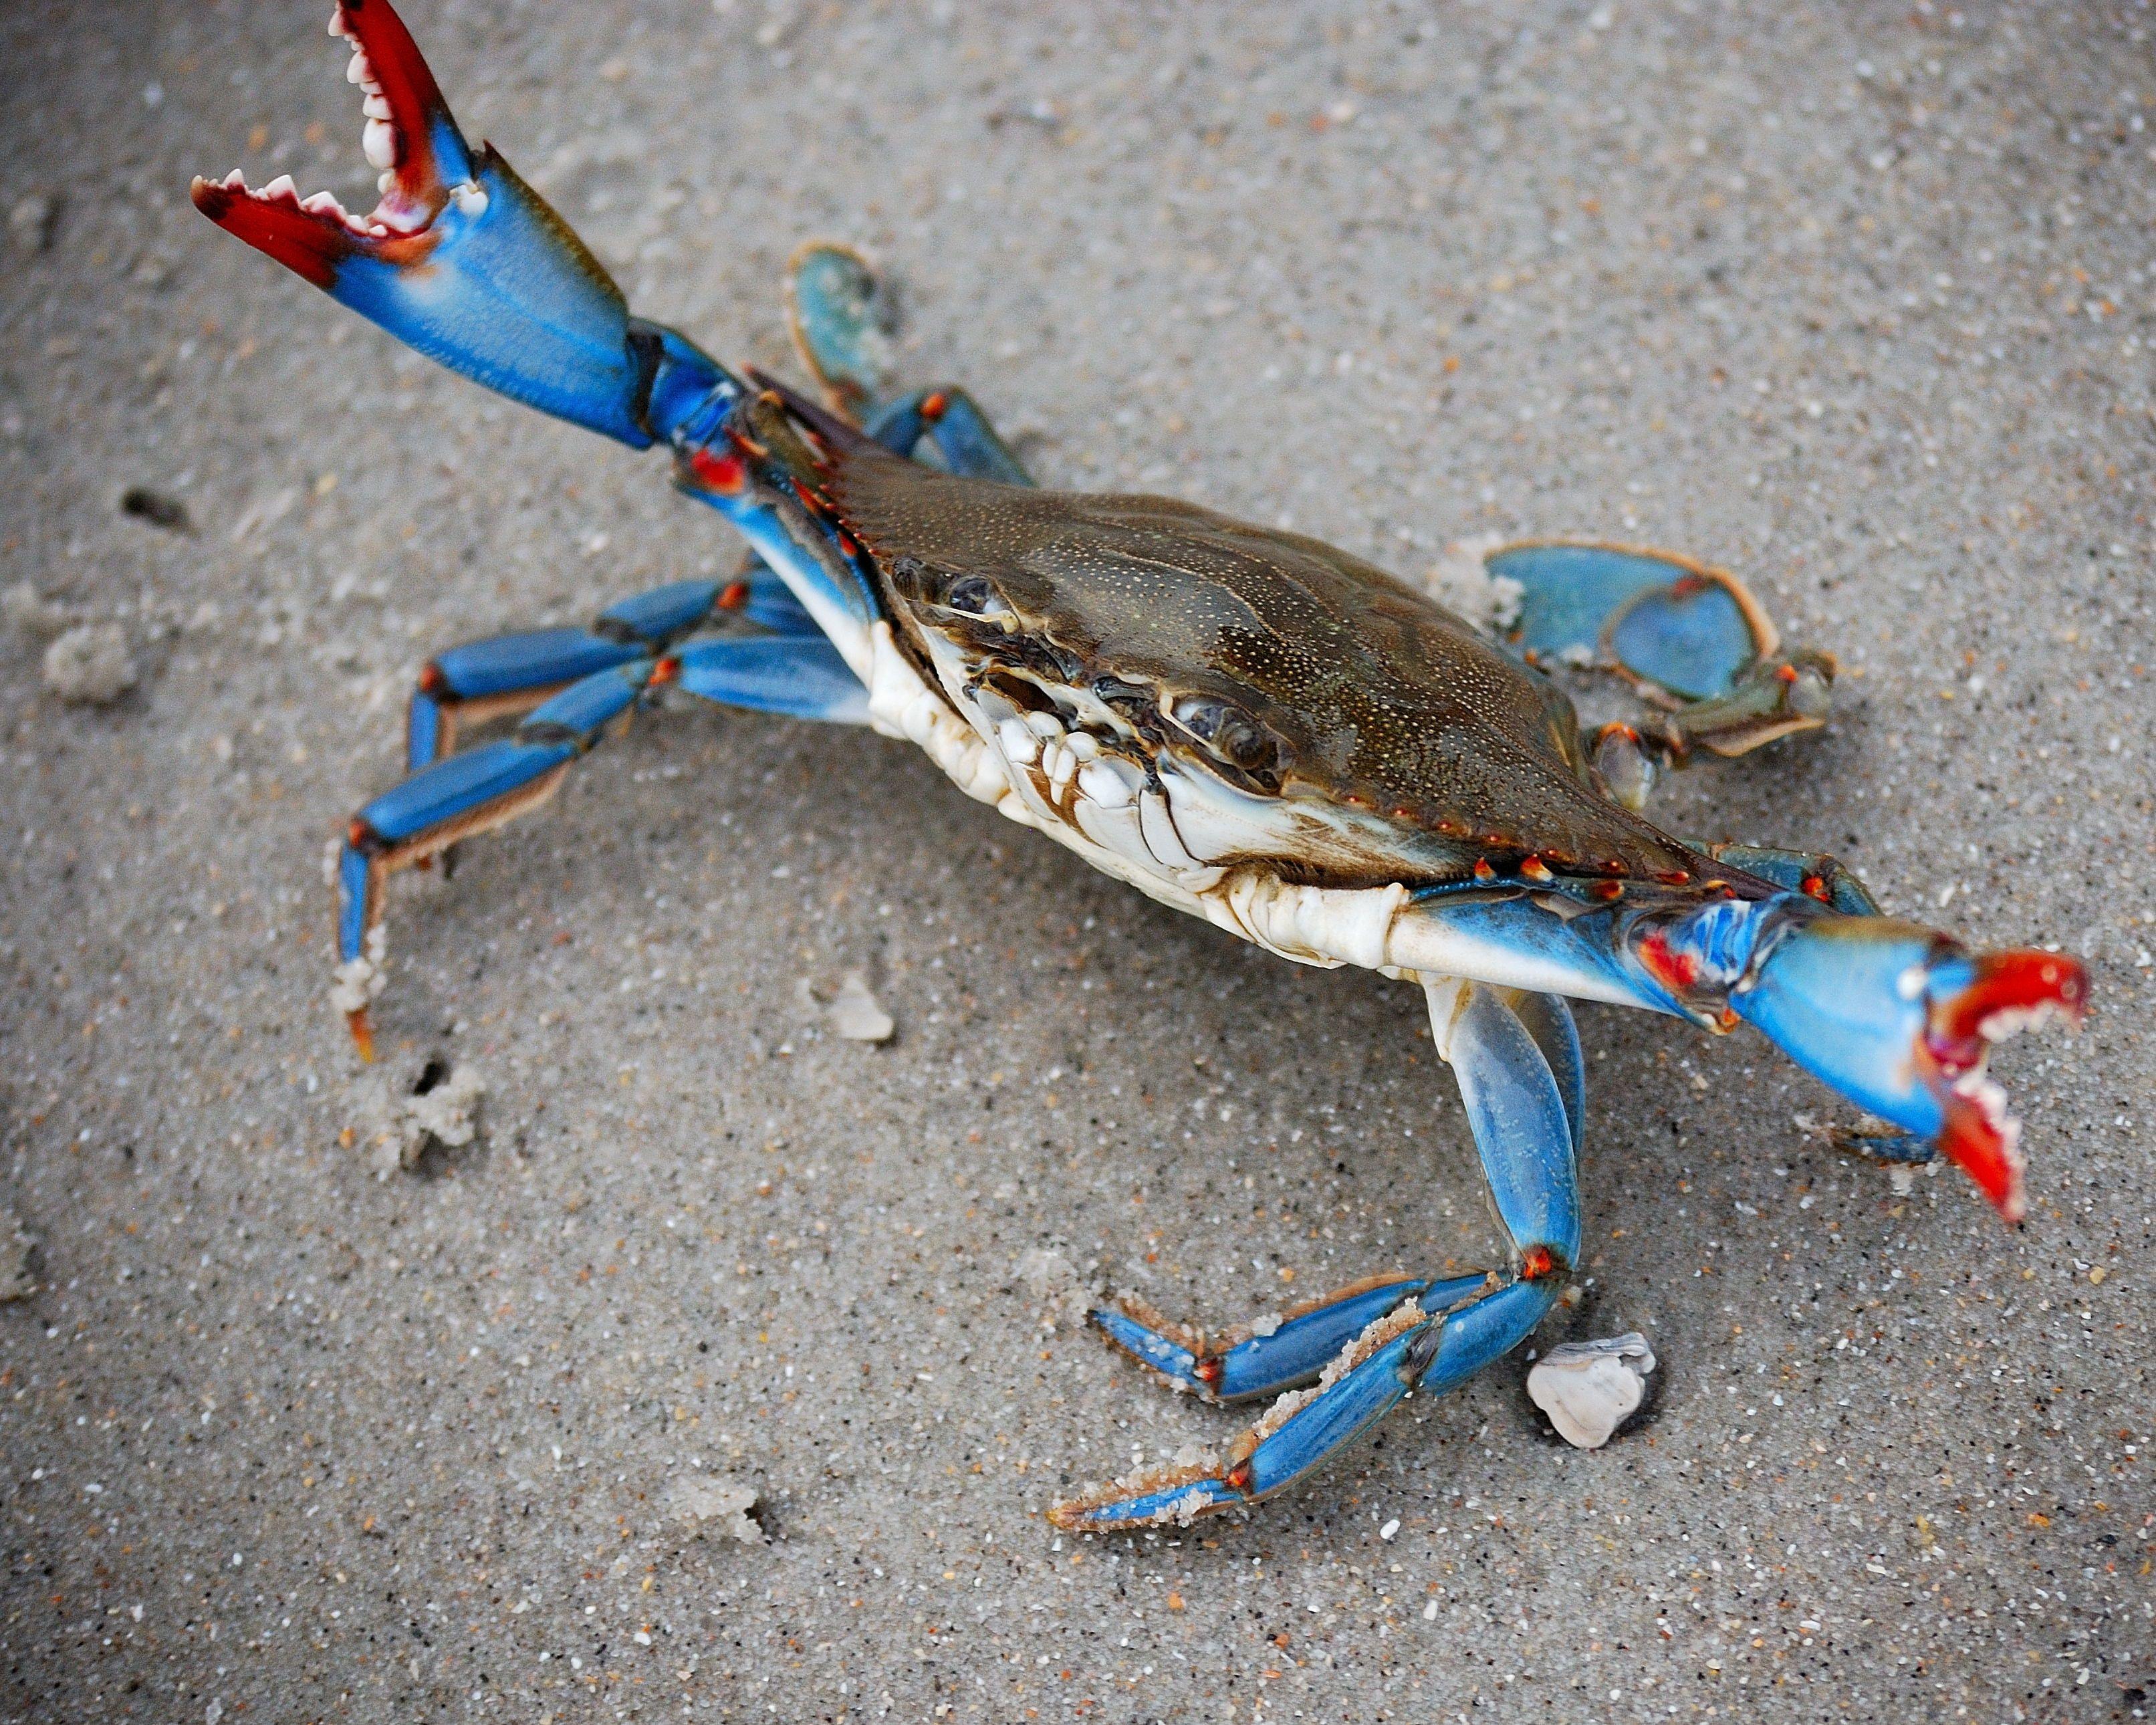 Blue Crab At Myrtle Beach Crab Crab Art Blue Crabs Art